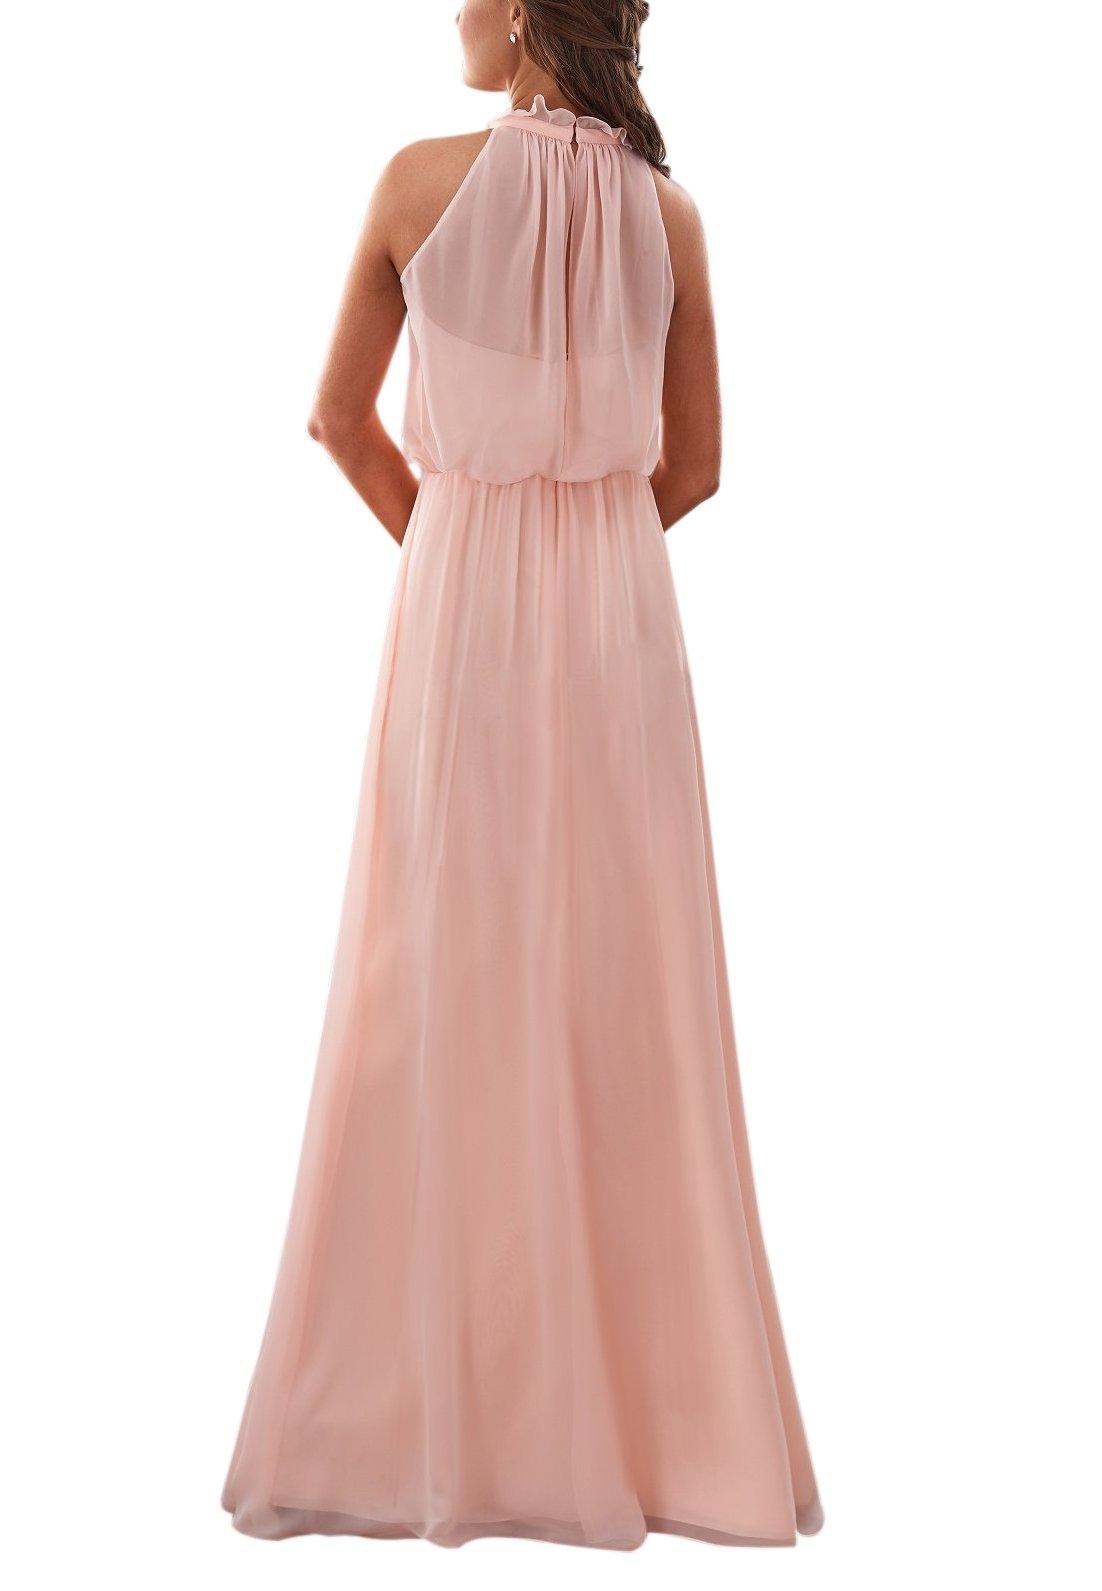 LoveMyth Womens Chiffon Spring Halter A-Line Backless Bridesmaid Formal Party Dress